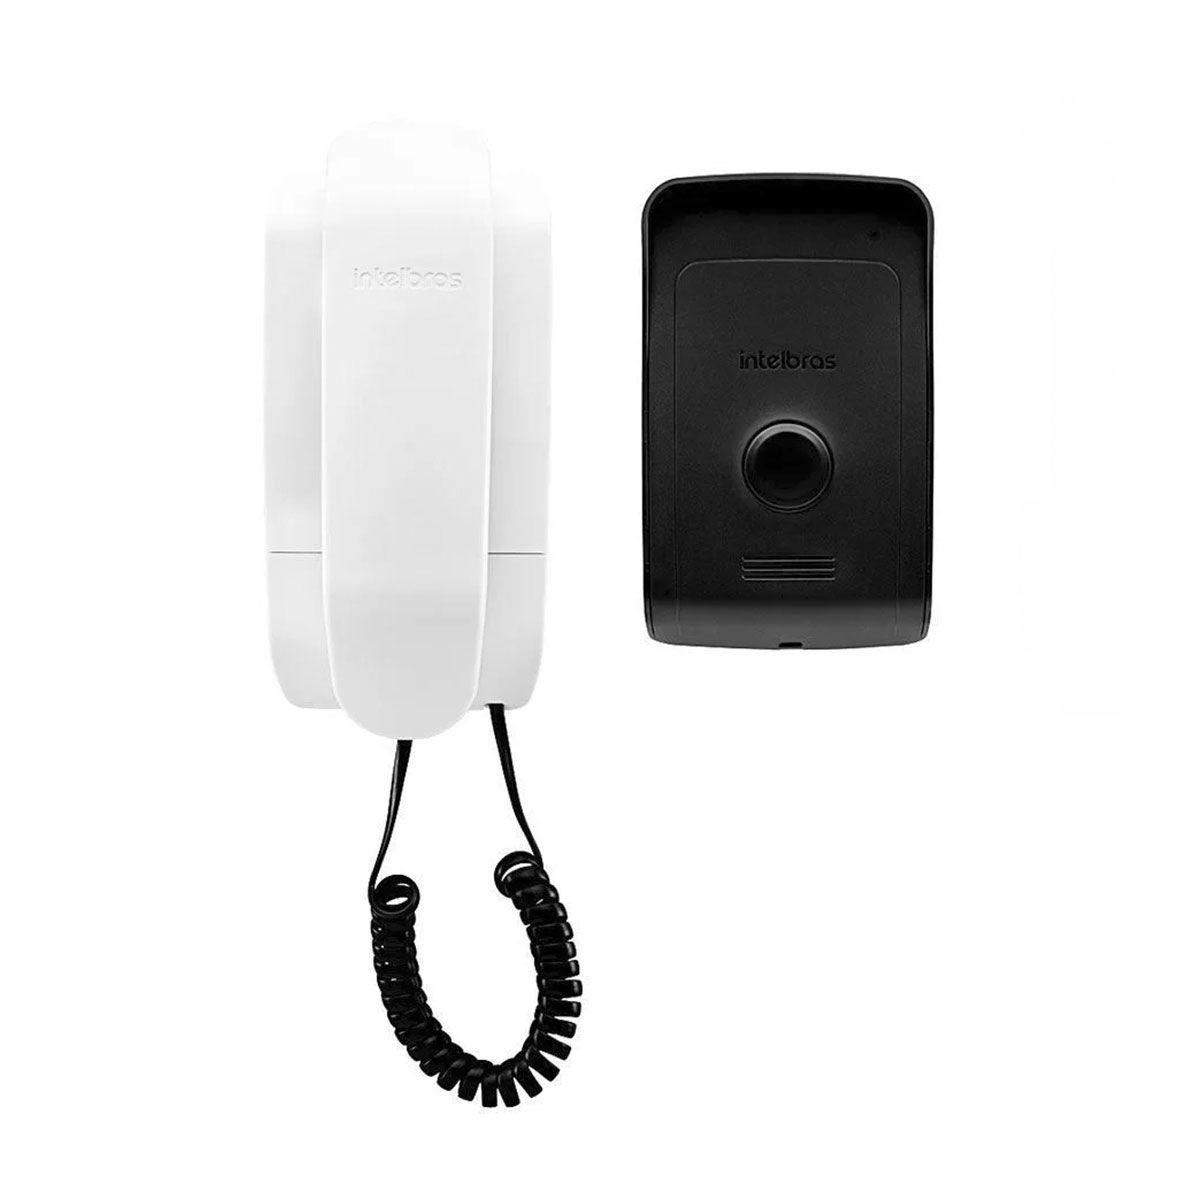 Interfone Residencial Porteiro Intelbras Ipr 1010